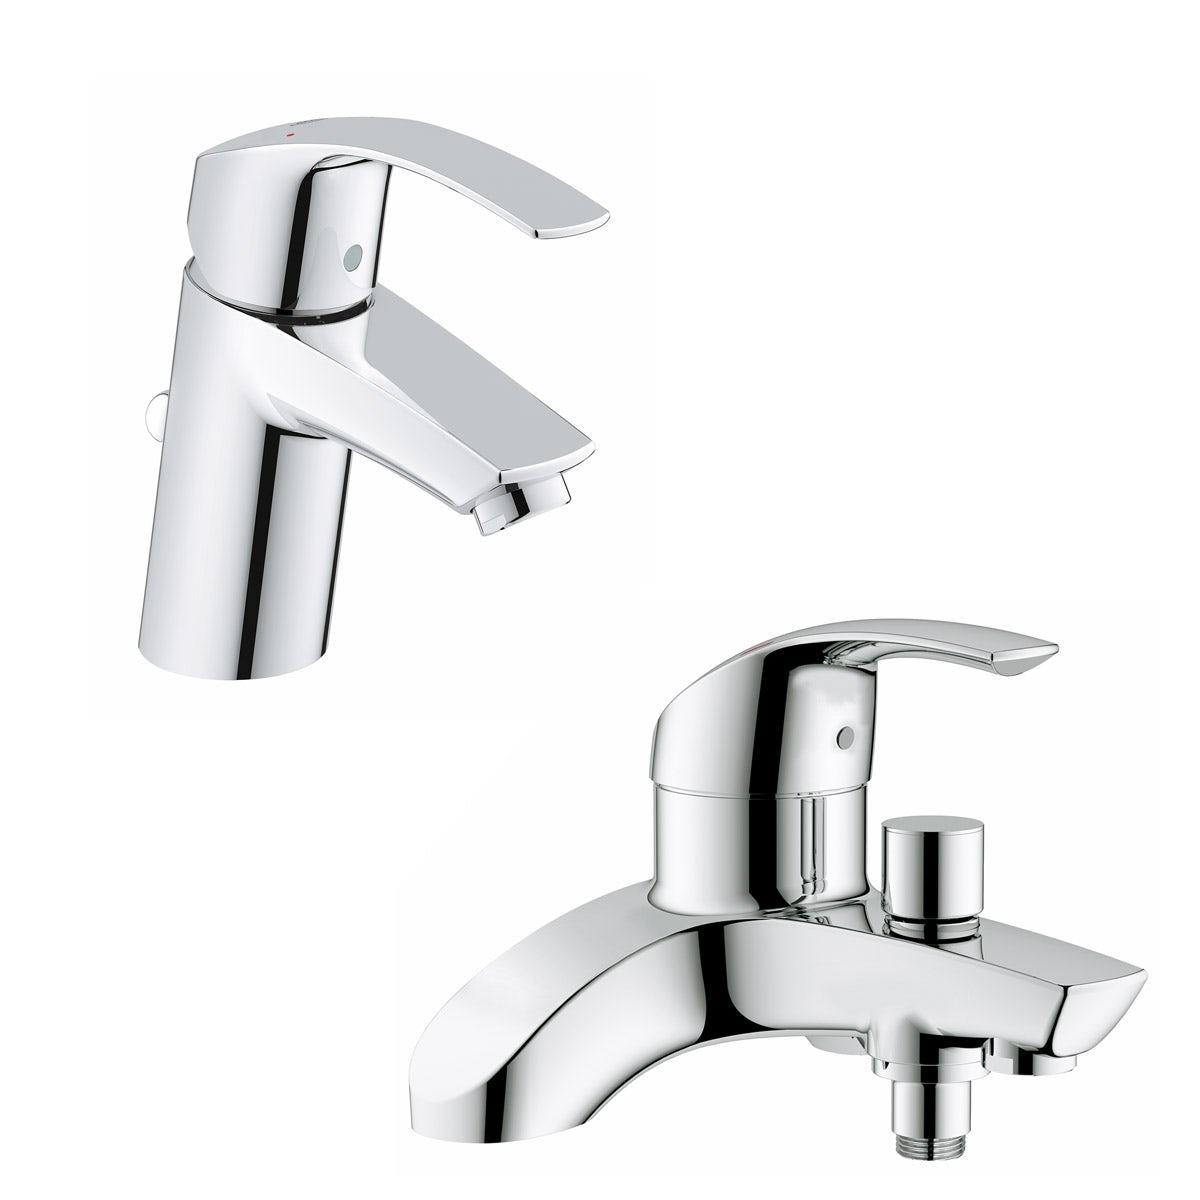 Grohe Eurosmart Basin And Bath Shower Mixer Tap Pack